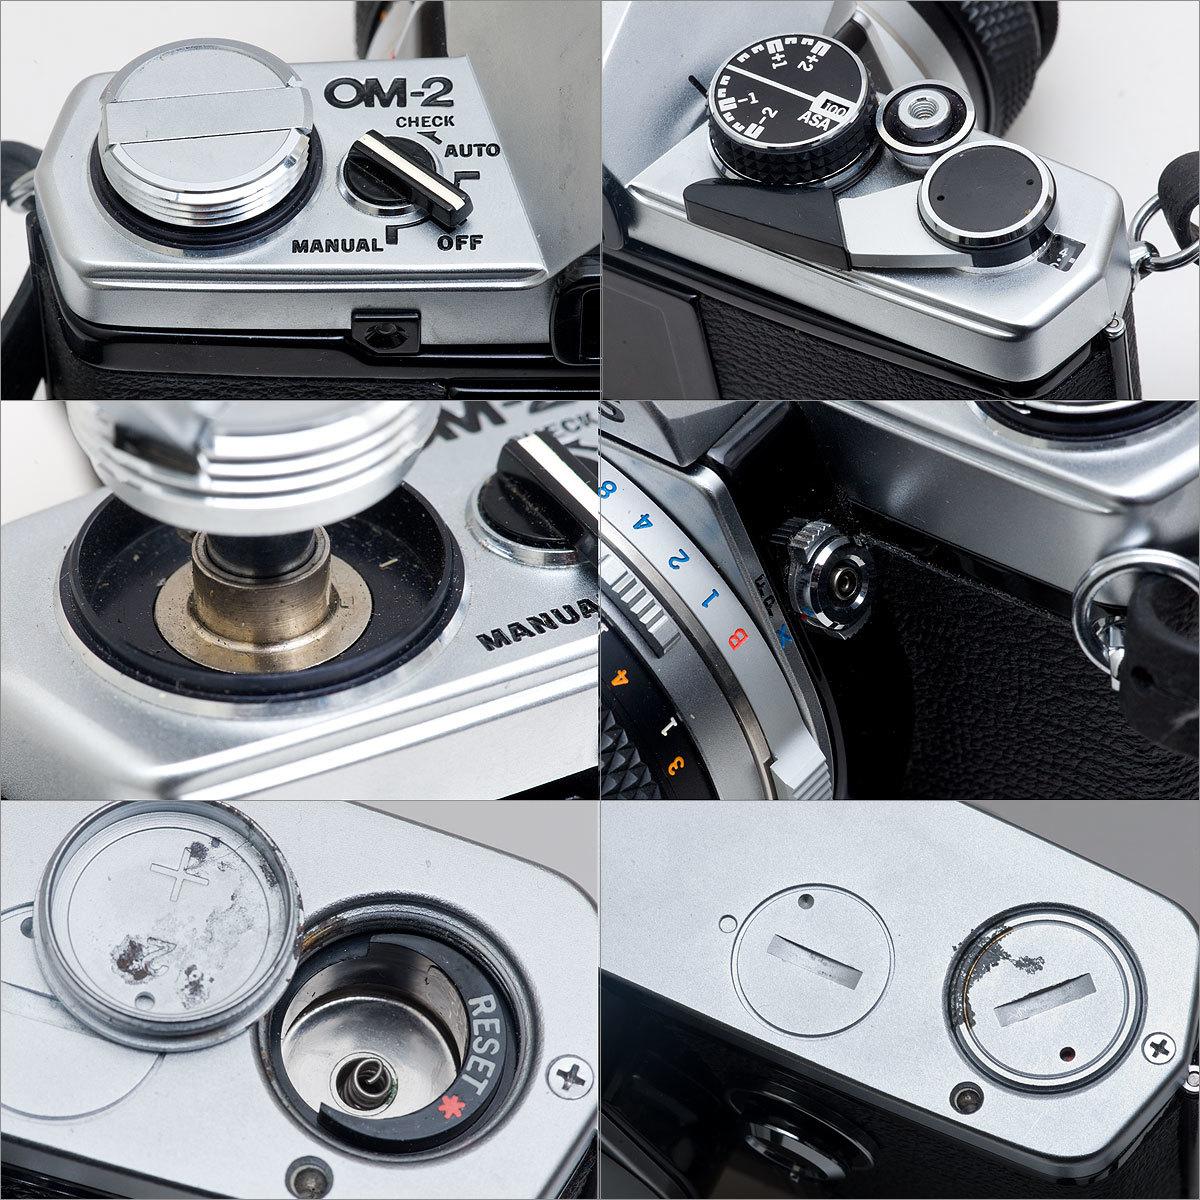 OLYMPUS OM-2 (接眼レンズ部クラック)G.ZUIKO AUTO-S 1:1.4 f=50mm 速写ケース_画像3